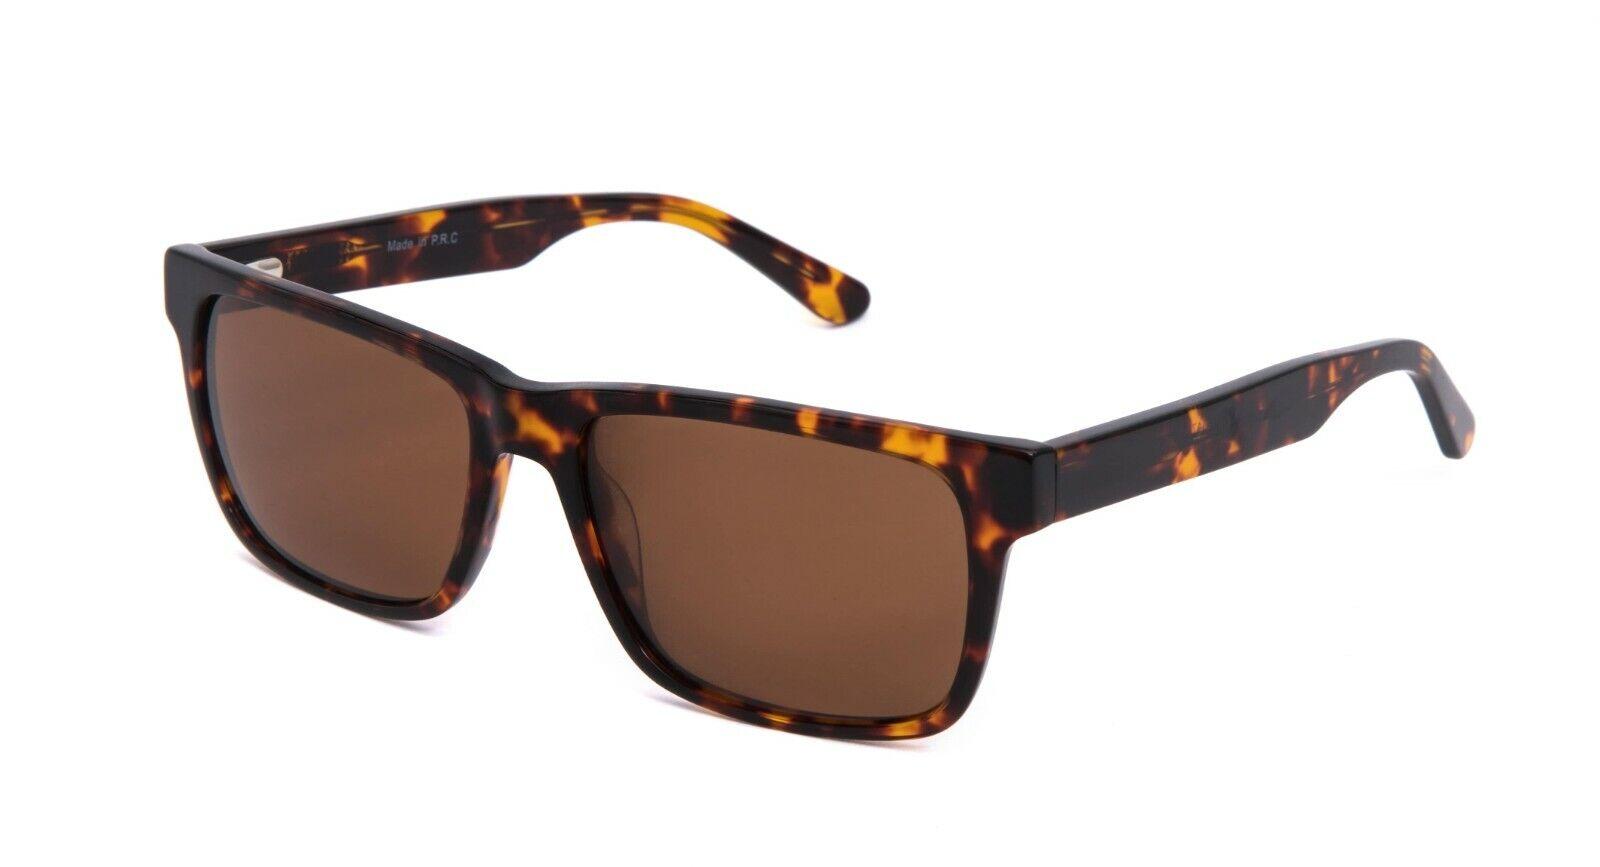 retro-square-polarized-sunglasses-for-men-women-designer-style-high-end